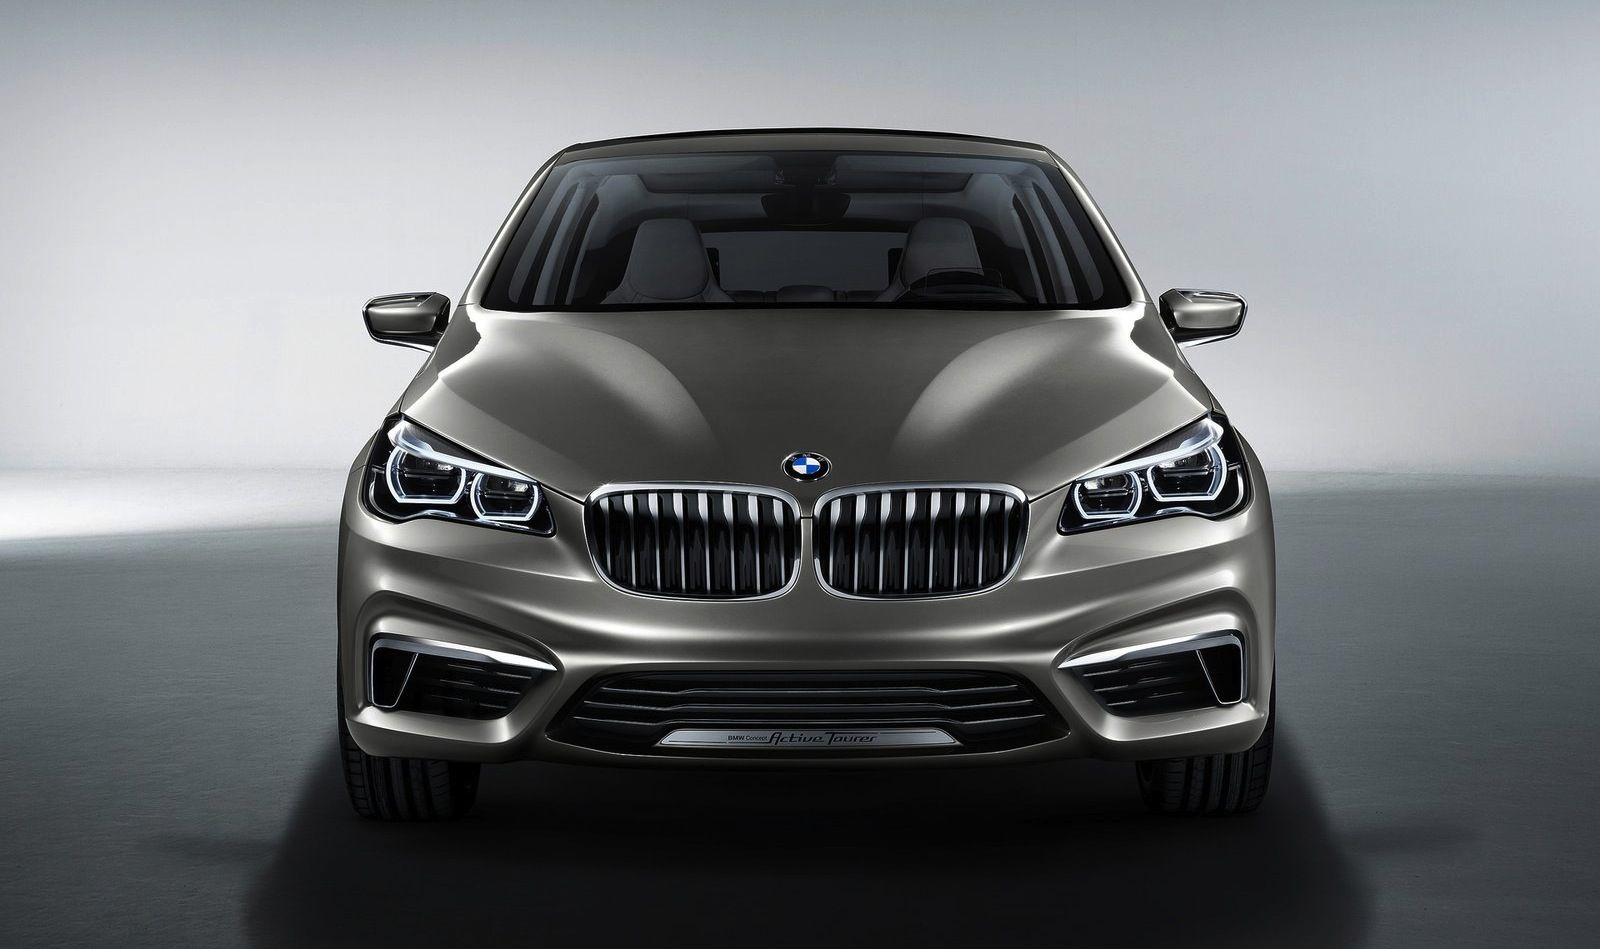 2017 Bmw 1 Series Sedan Specs And Price Http Www Autocarkr Com